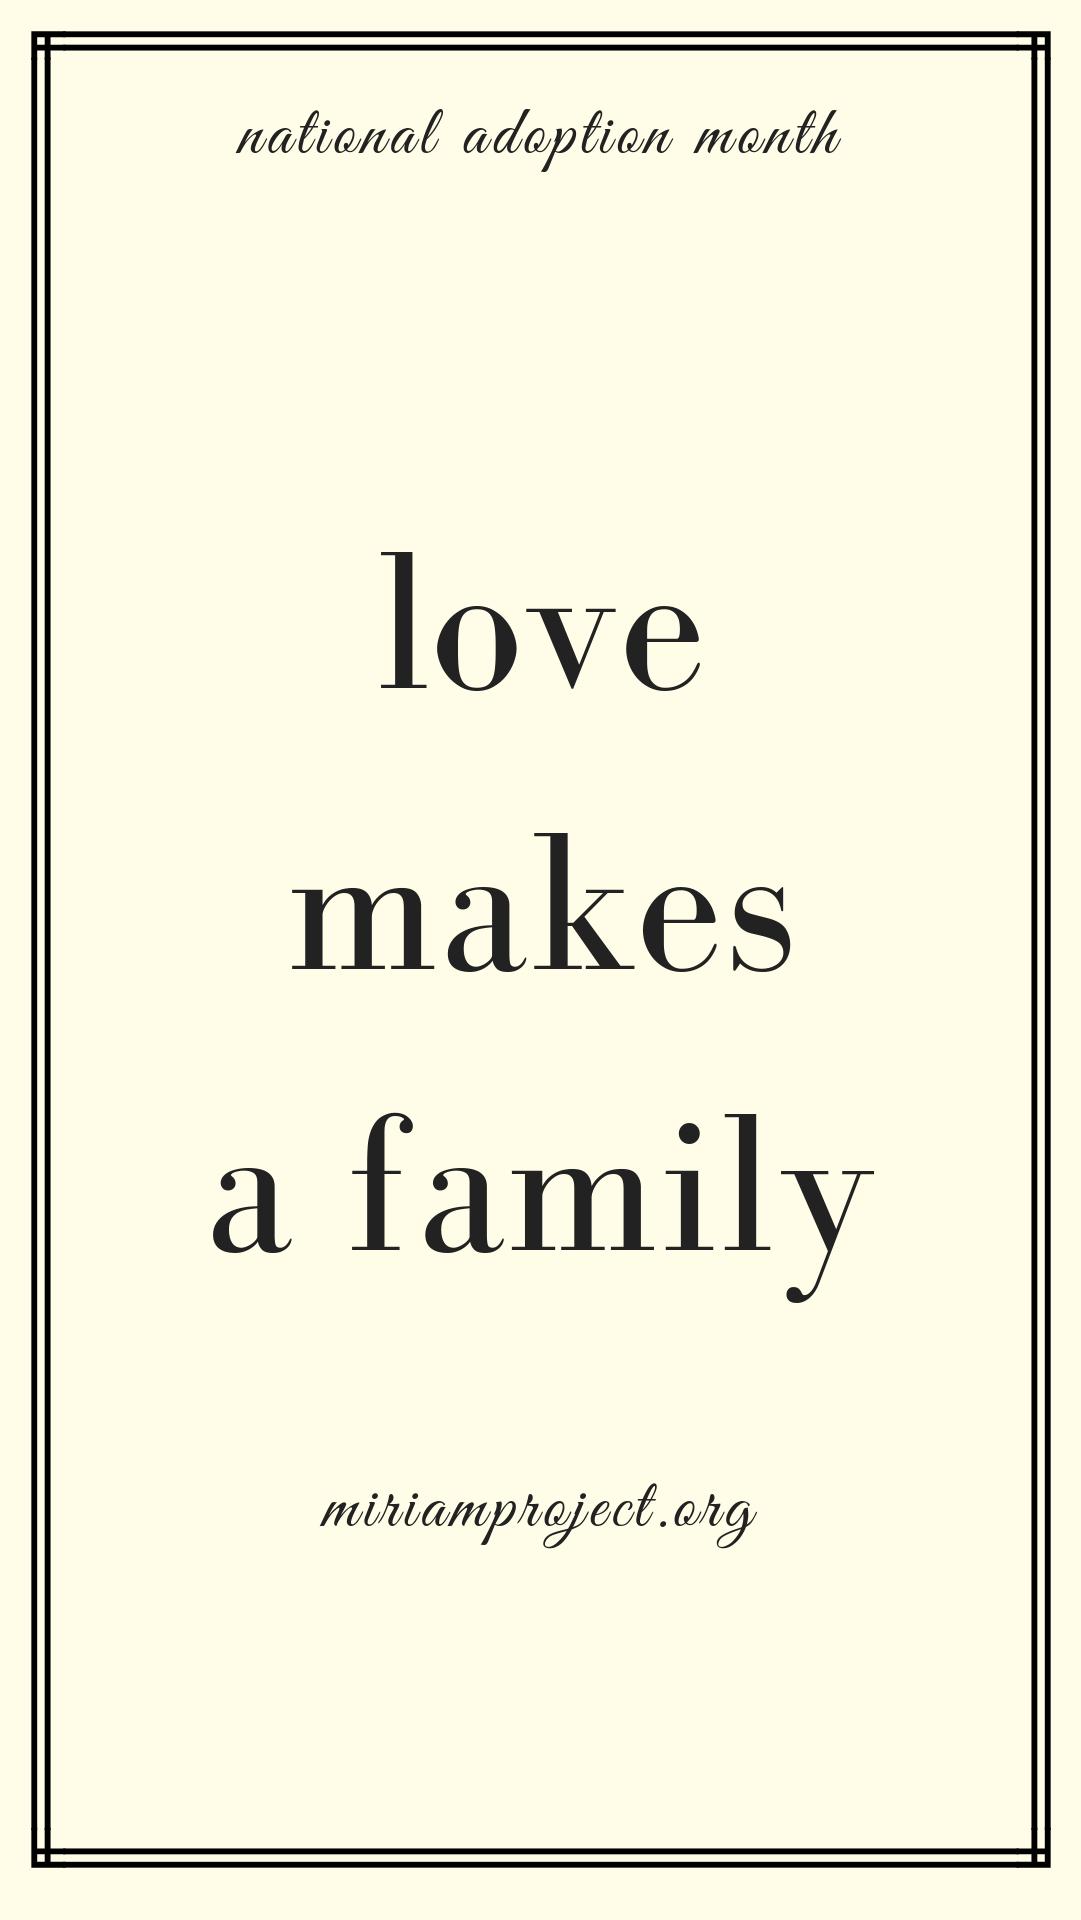 Phone Wallpaper Nationaladoptionmonth Adoption Wallpaper National Adoption Month Make A Family Adoption